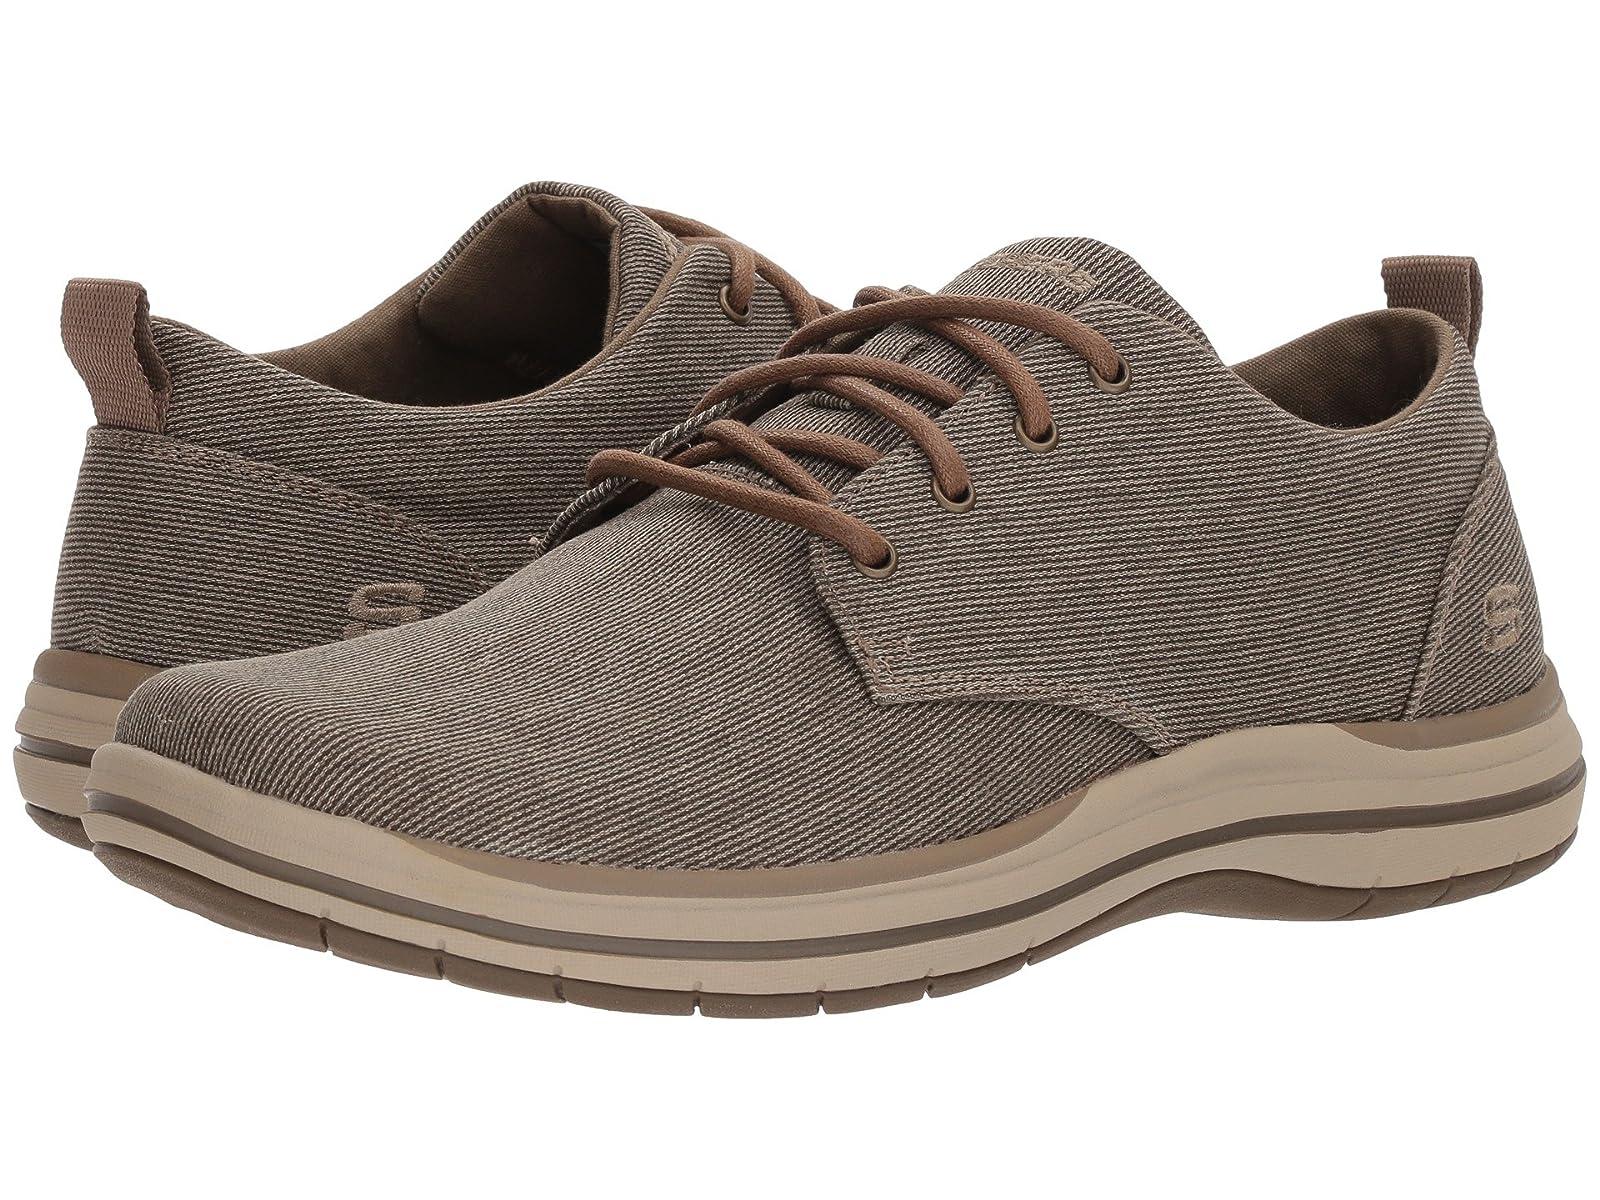 SKECHERS Classic Fit Elson - MotenAtmospheric grades have affordable shoes